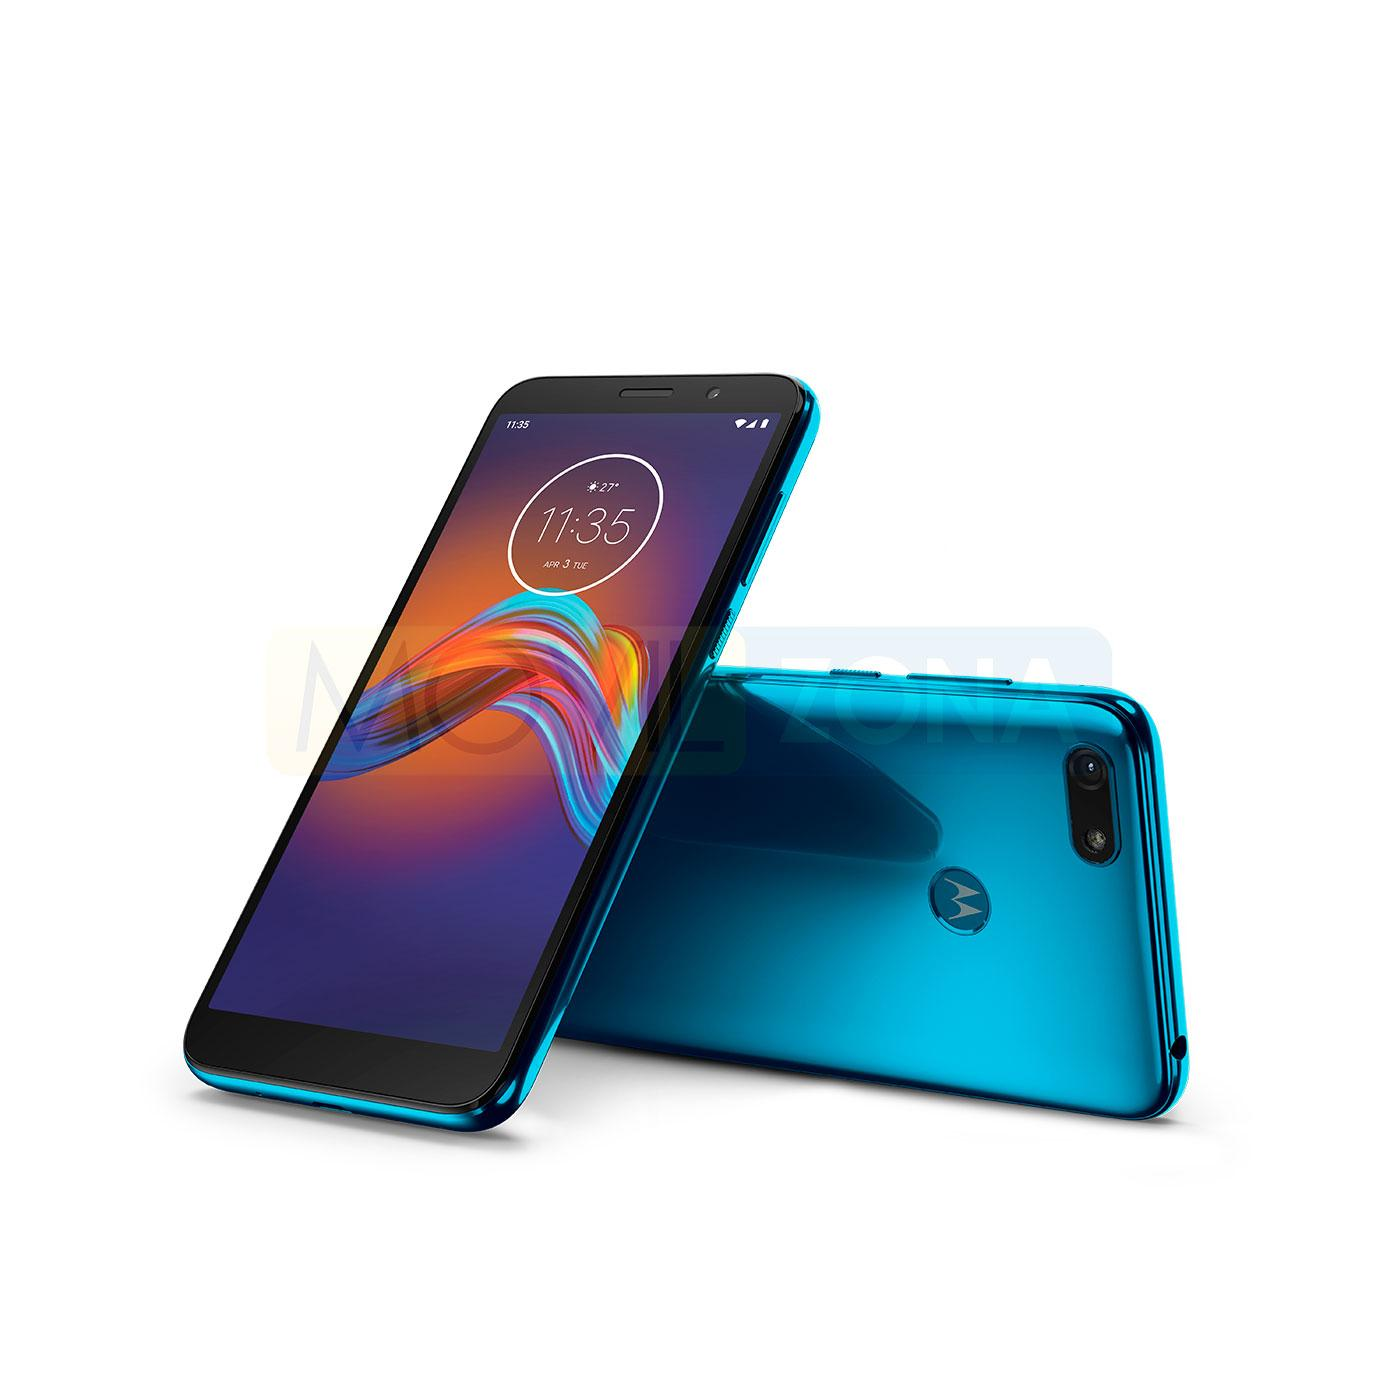 Motorola Moto E6 Play frontal y trasera